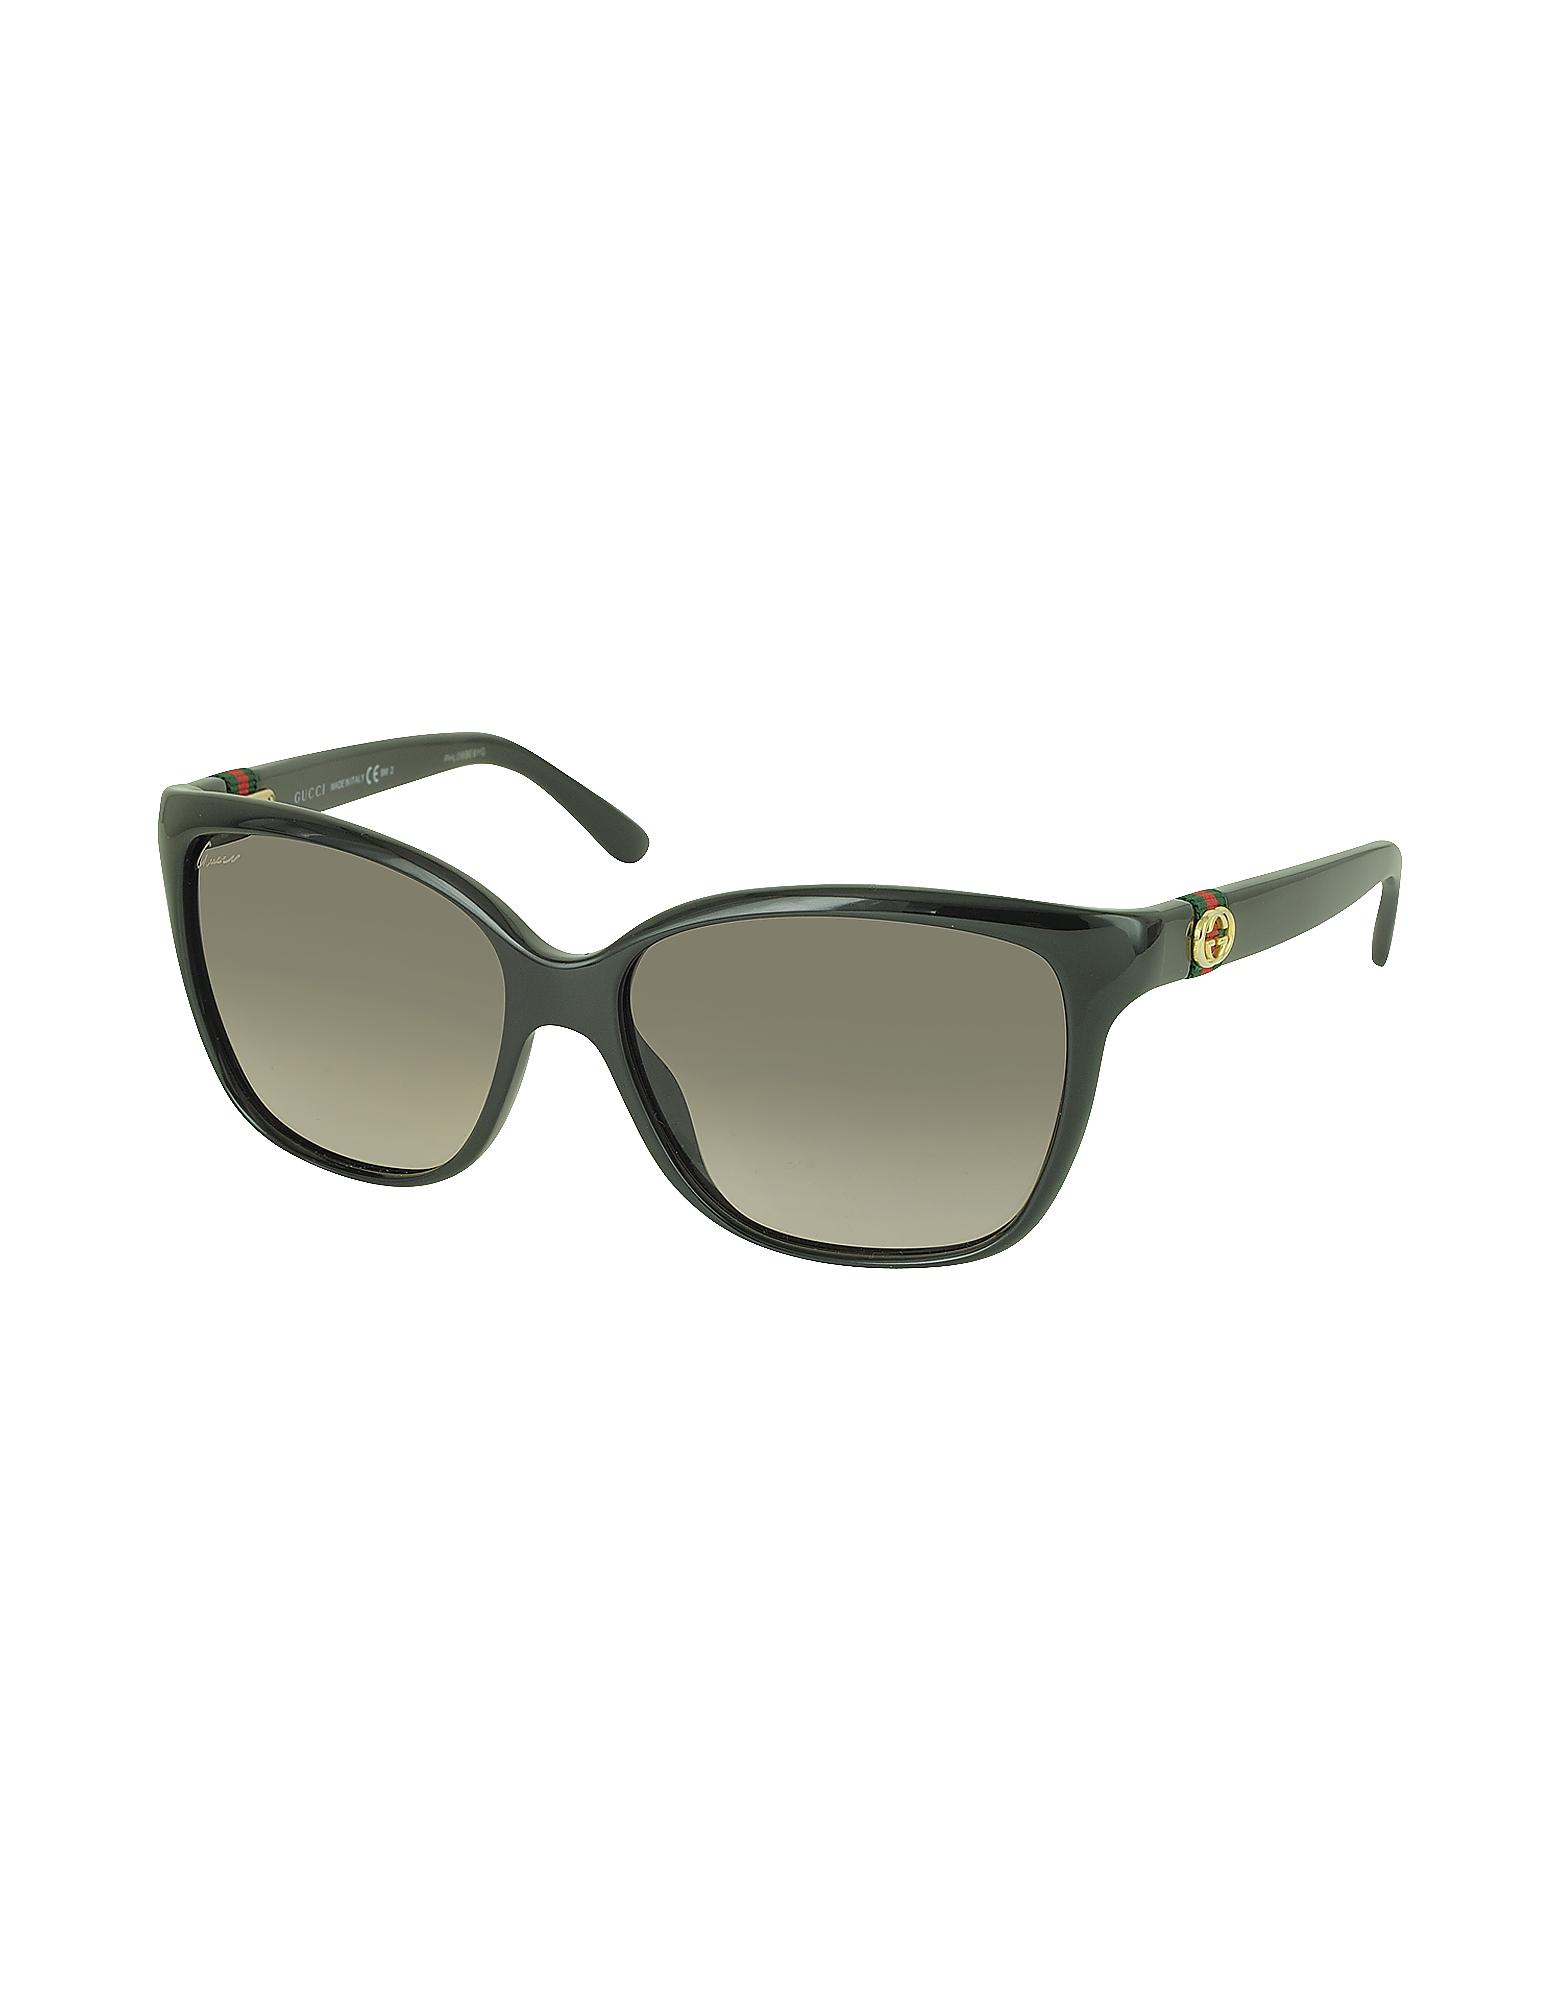 792fb9b23d0 Lyst - Gucci Gg 3645 s Shiny Cat-eye Women s Sunglasses in Black